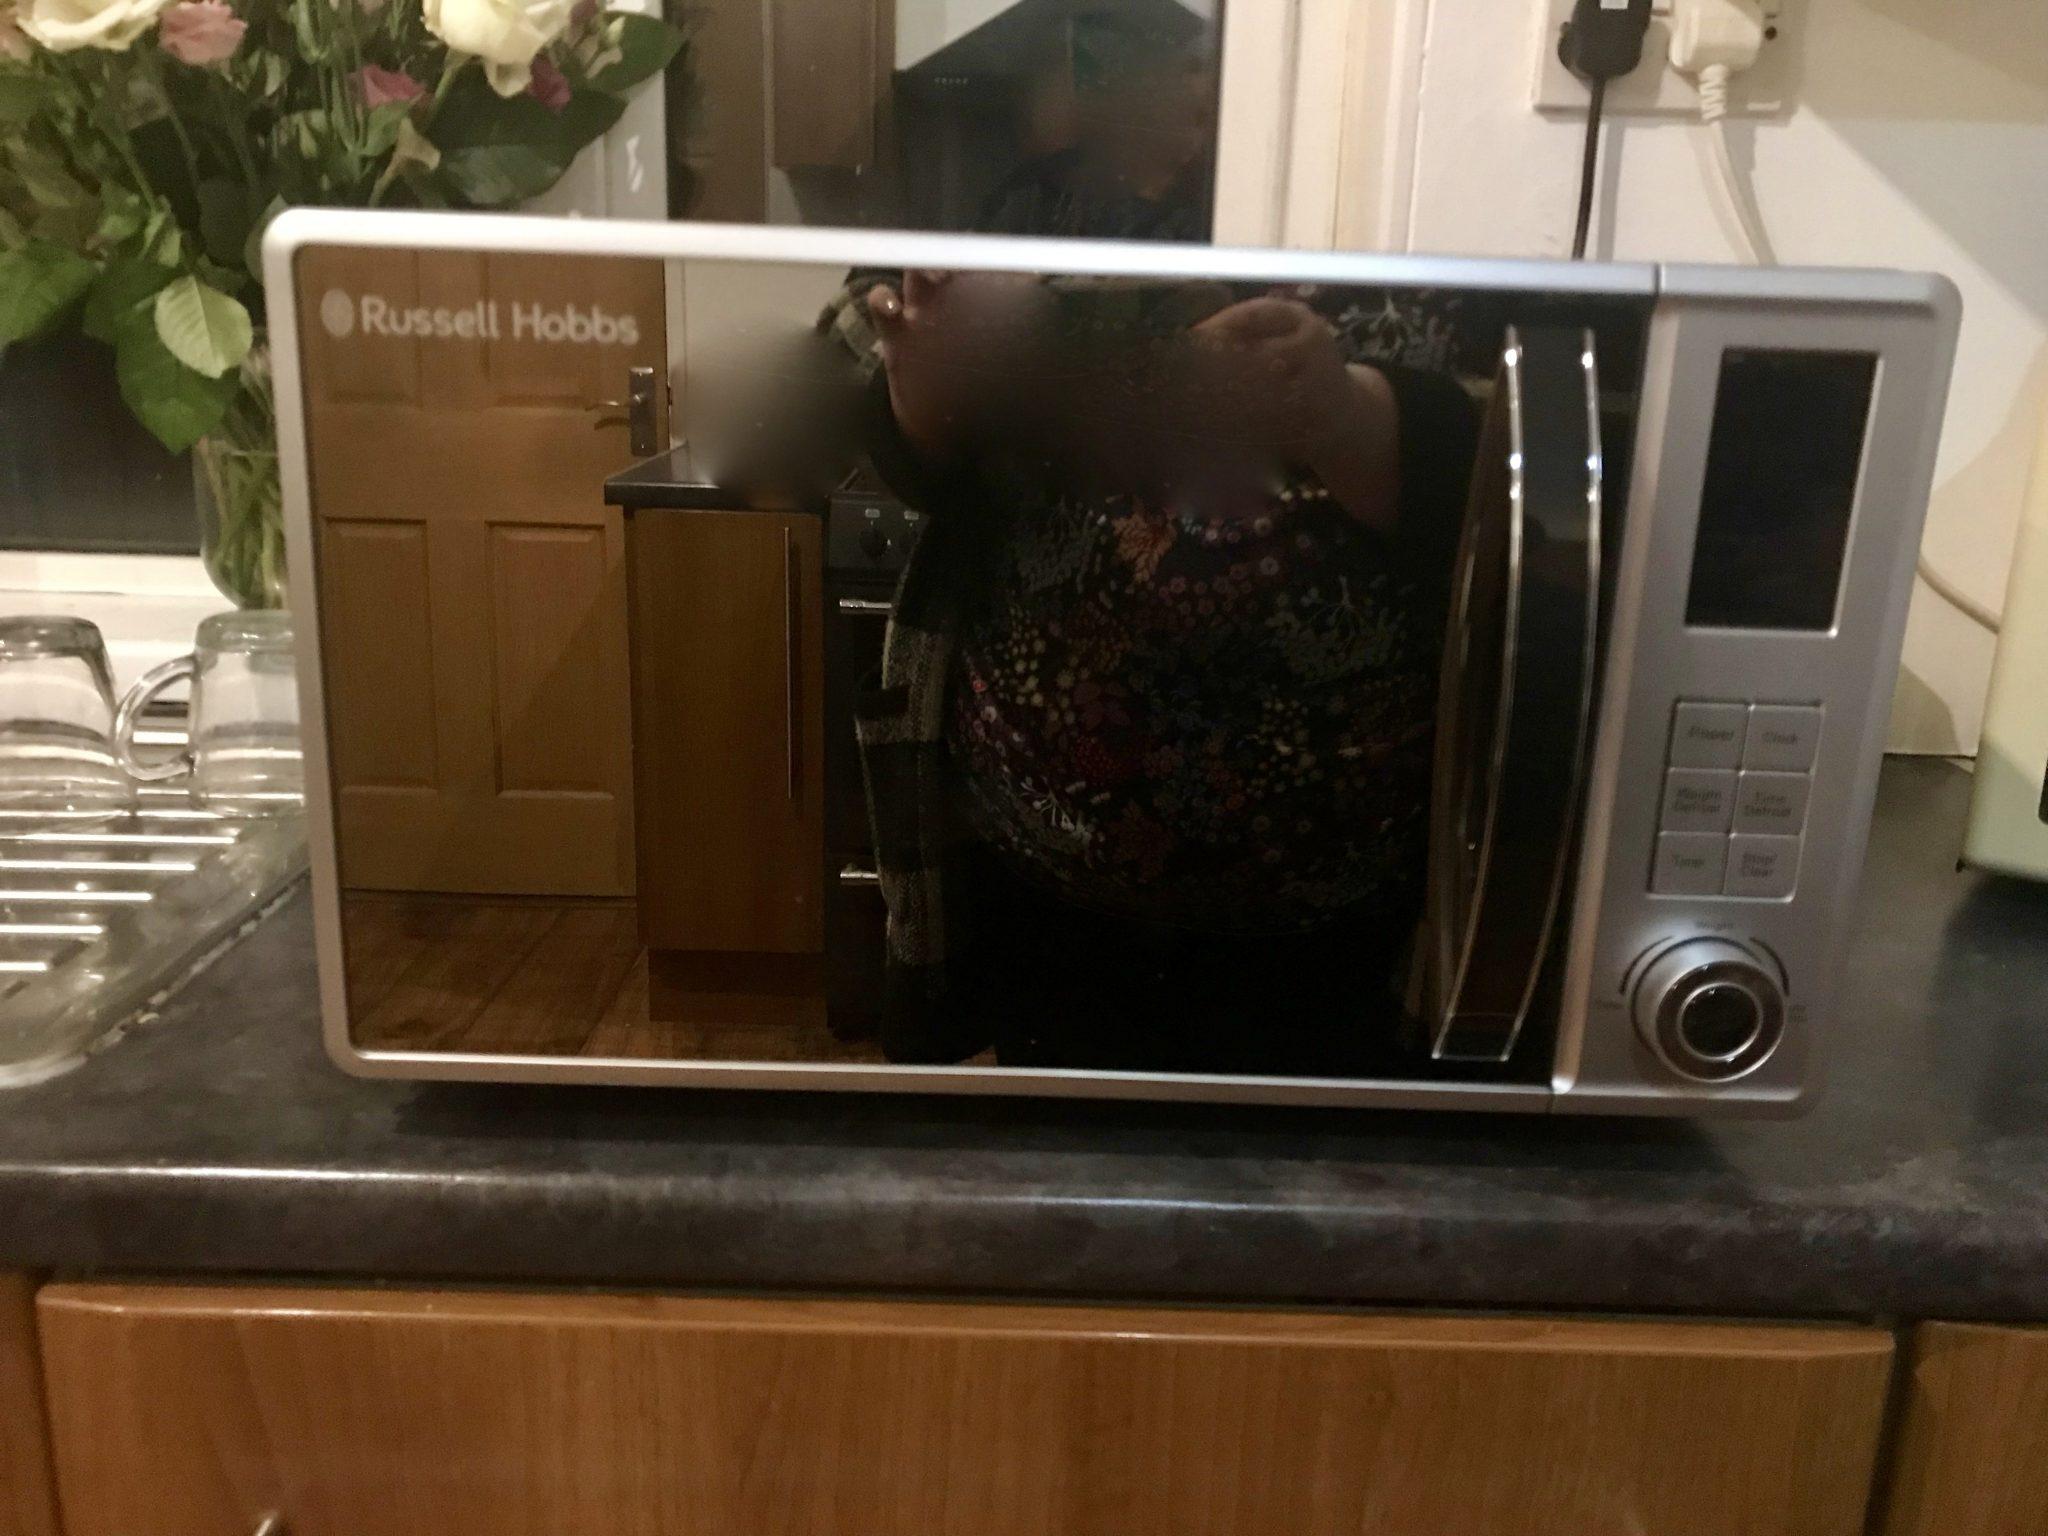 Russell Hobbs RHM2362S 23 Litre Microwave